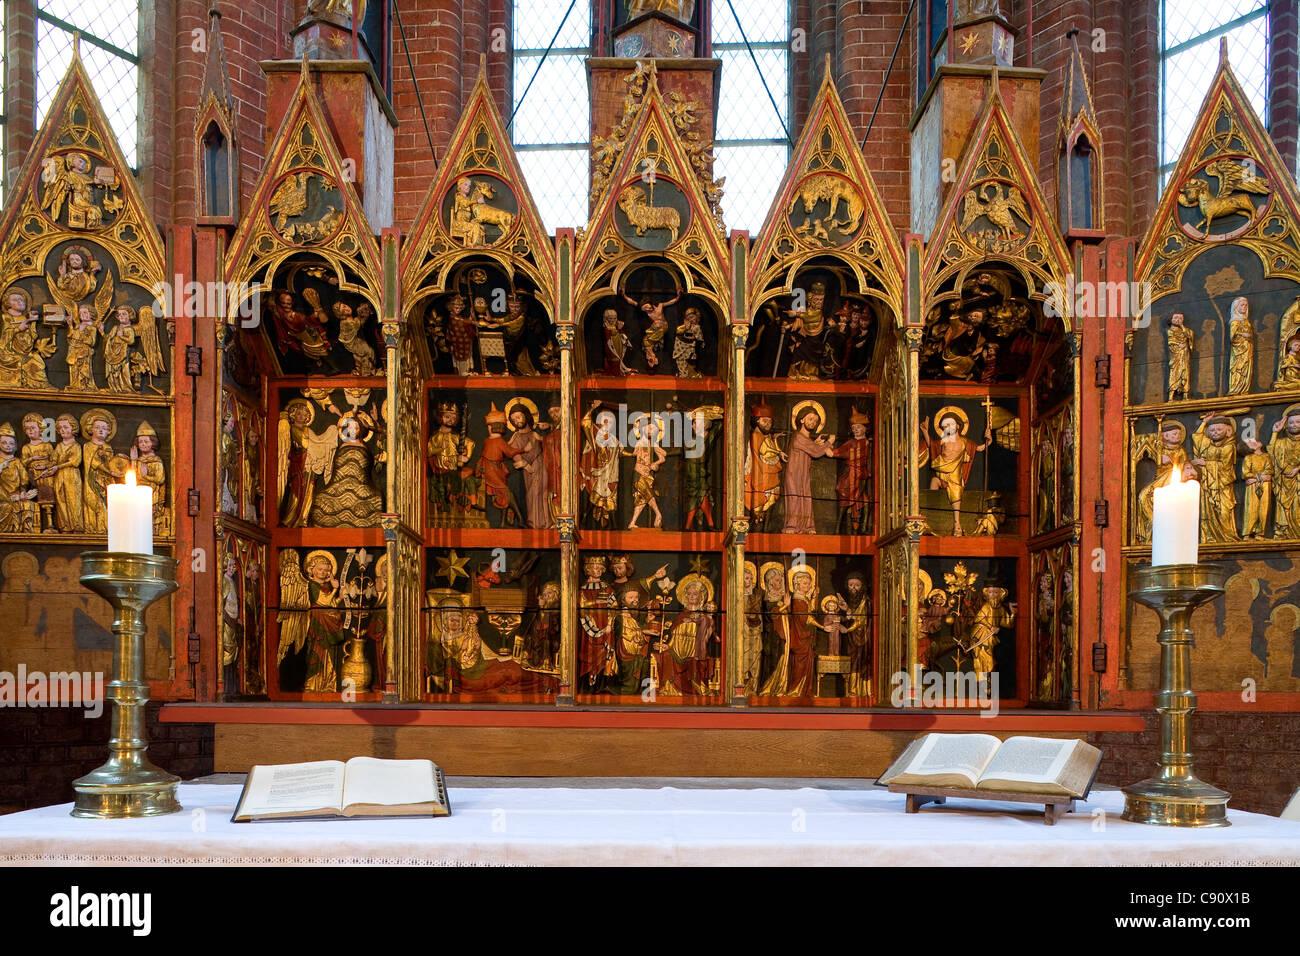 Altar of Cismar monastery, Cismar, Schleswig-Holstein, Germany, Europe - Stock Image